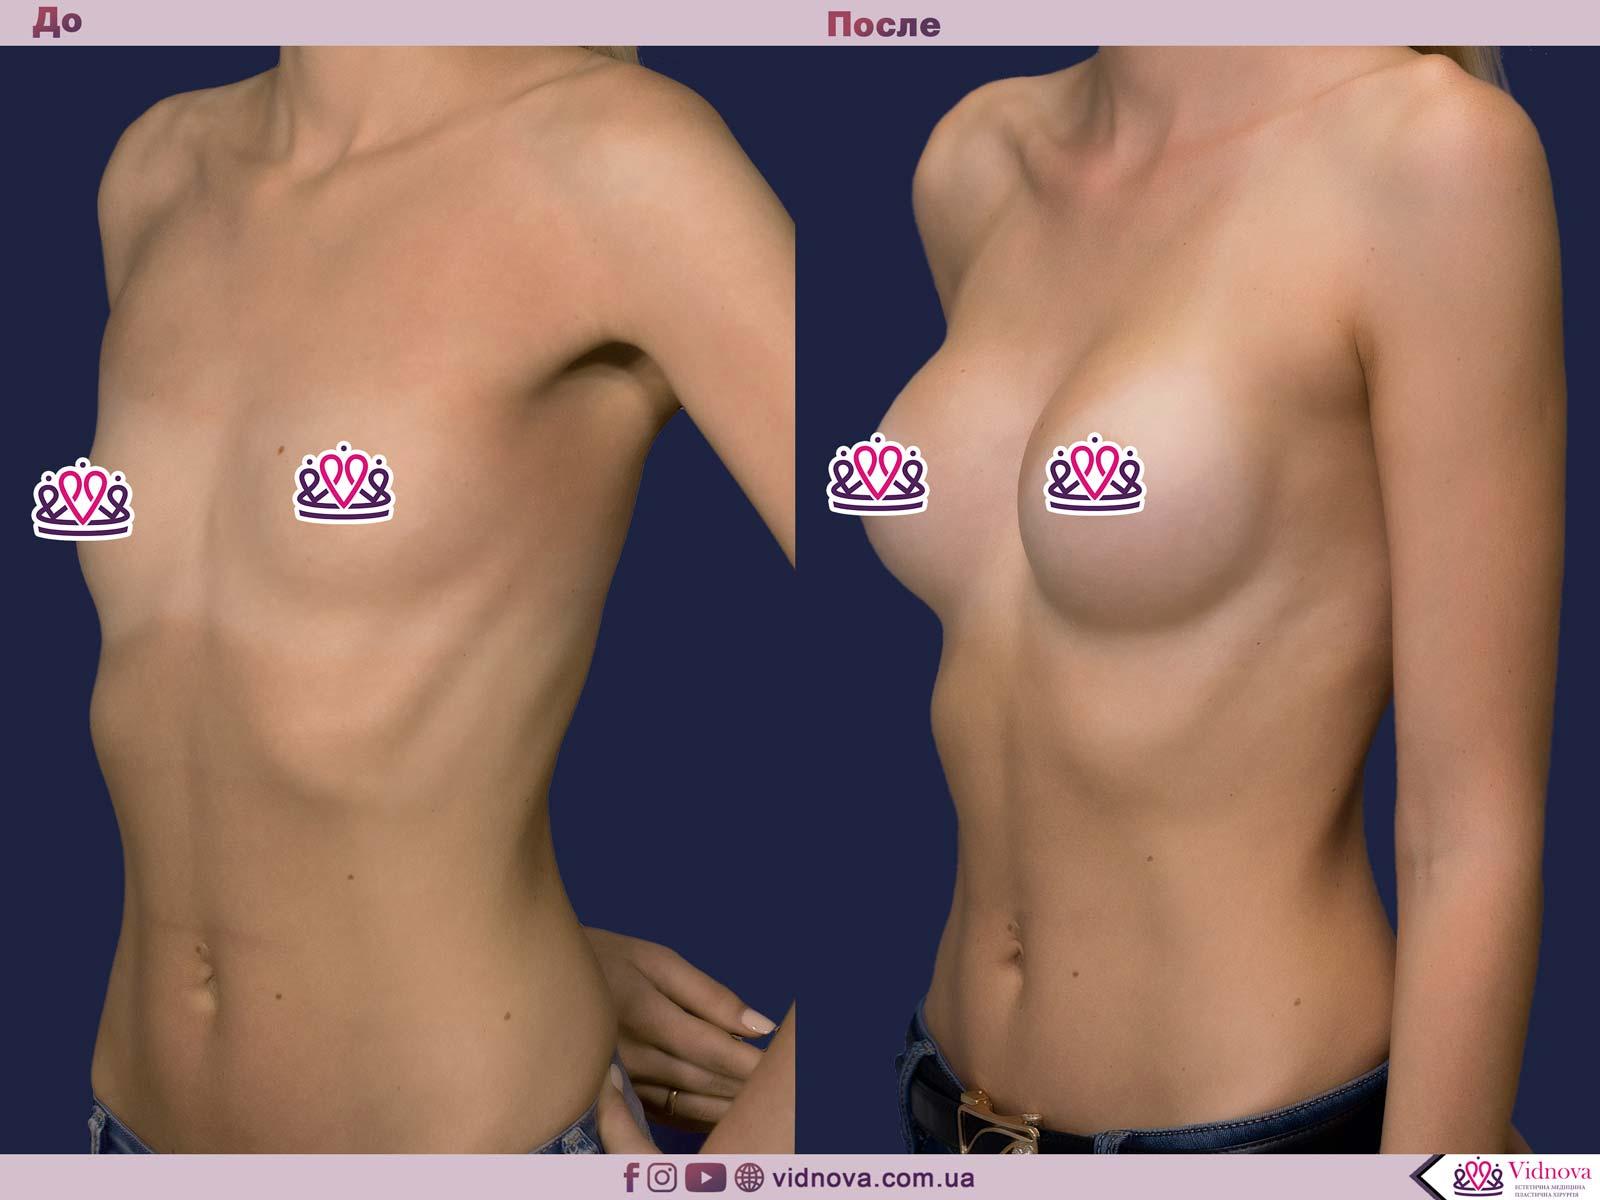 Увеличение груди: Фото ДО и ПОСЛЕ - Пример №83-2 - Клиника Vidnova